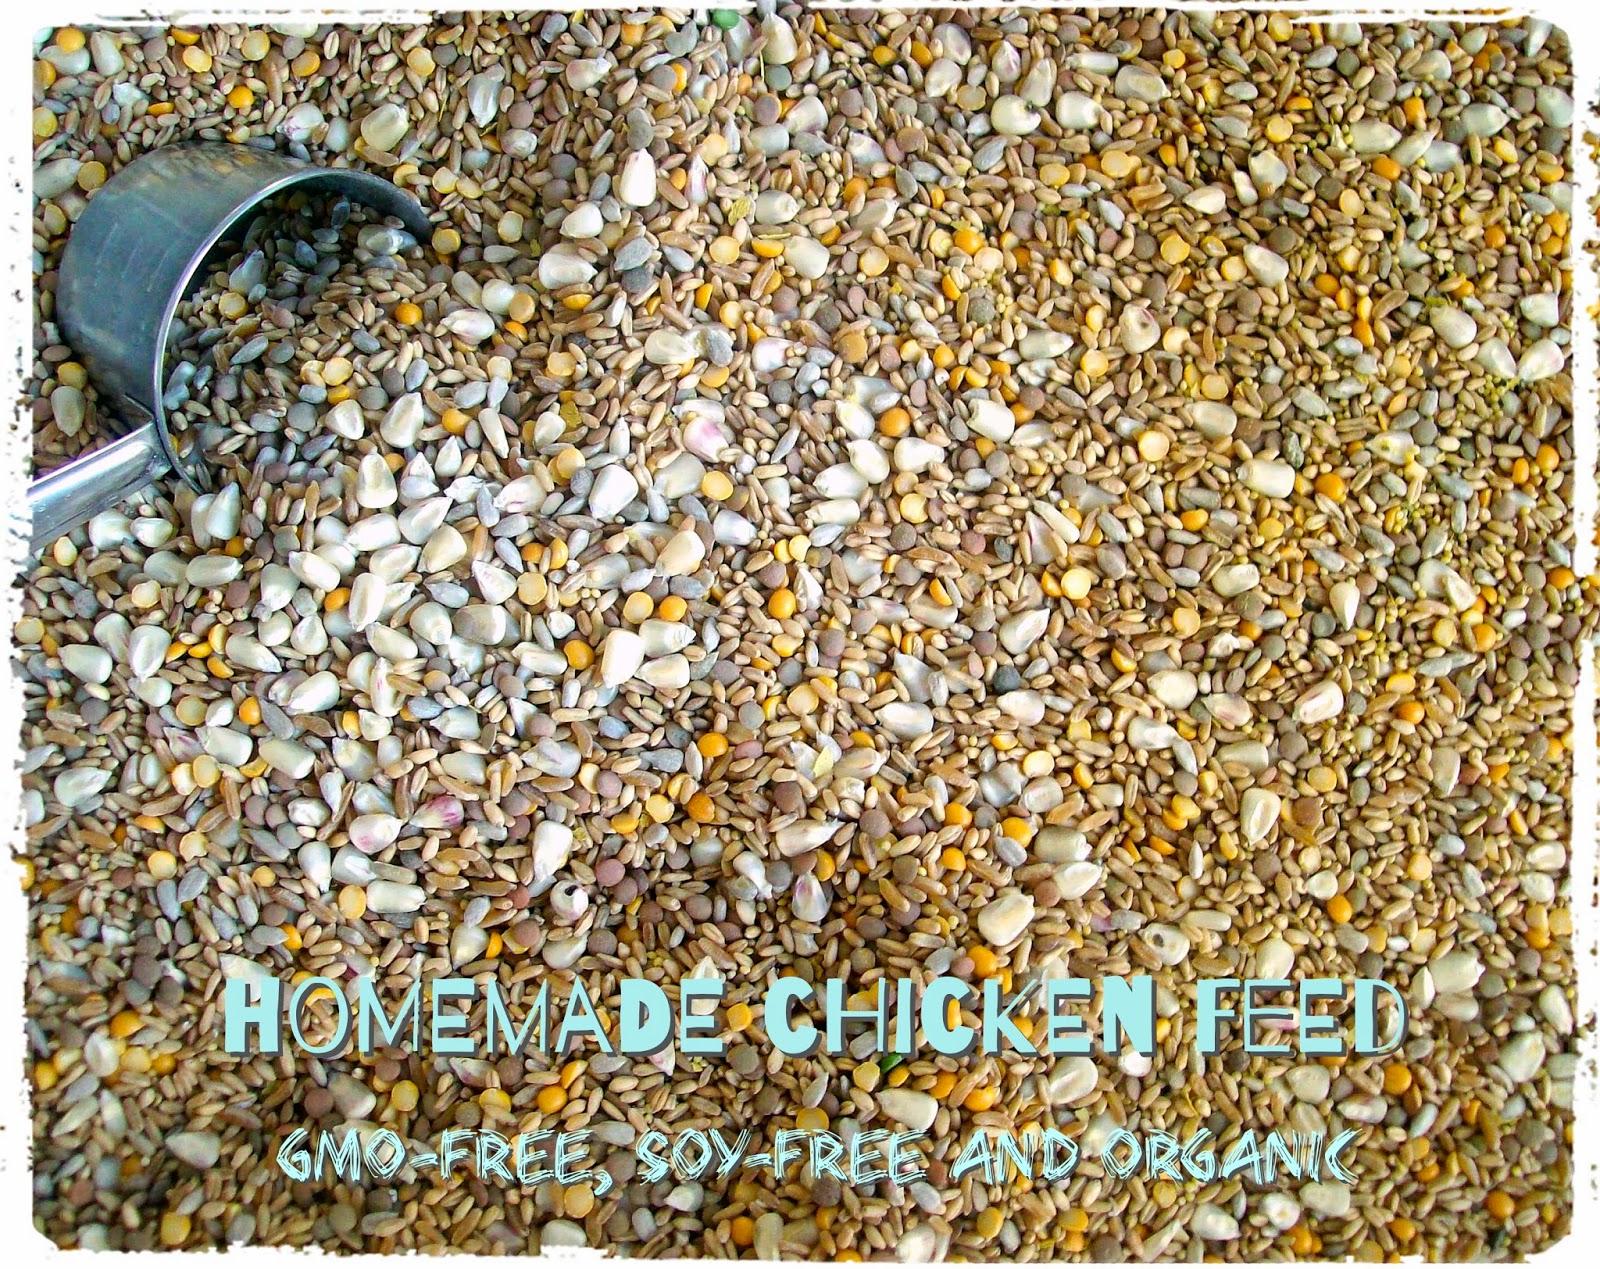 Crunchy Goodness Urban Homesteading Organic Gmo Free